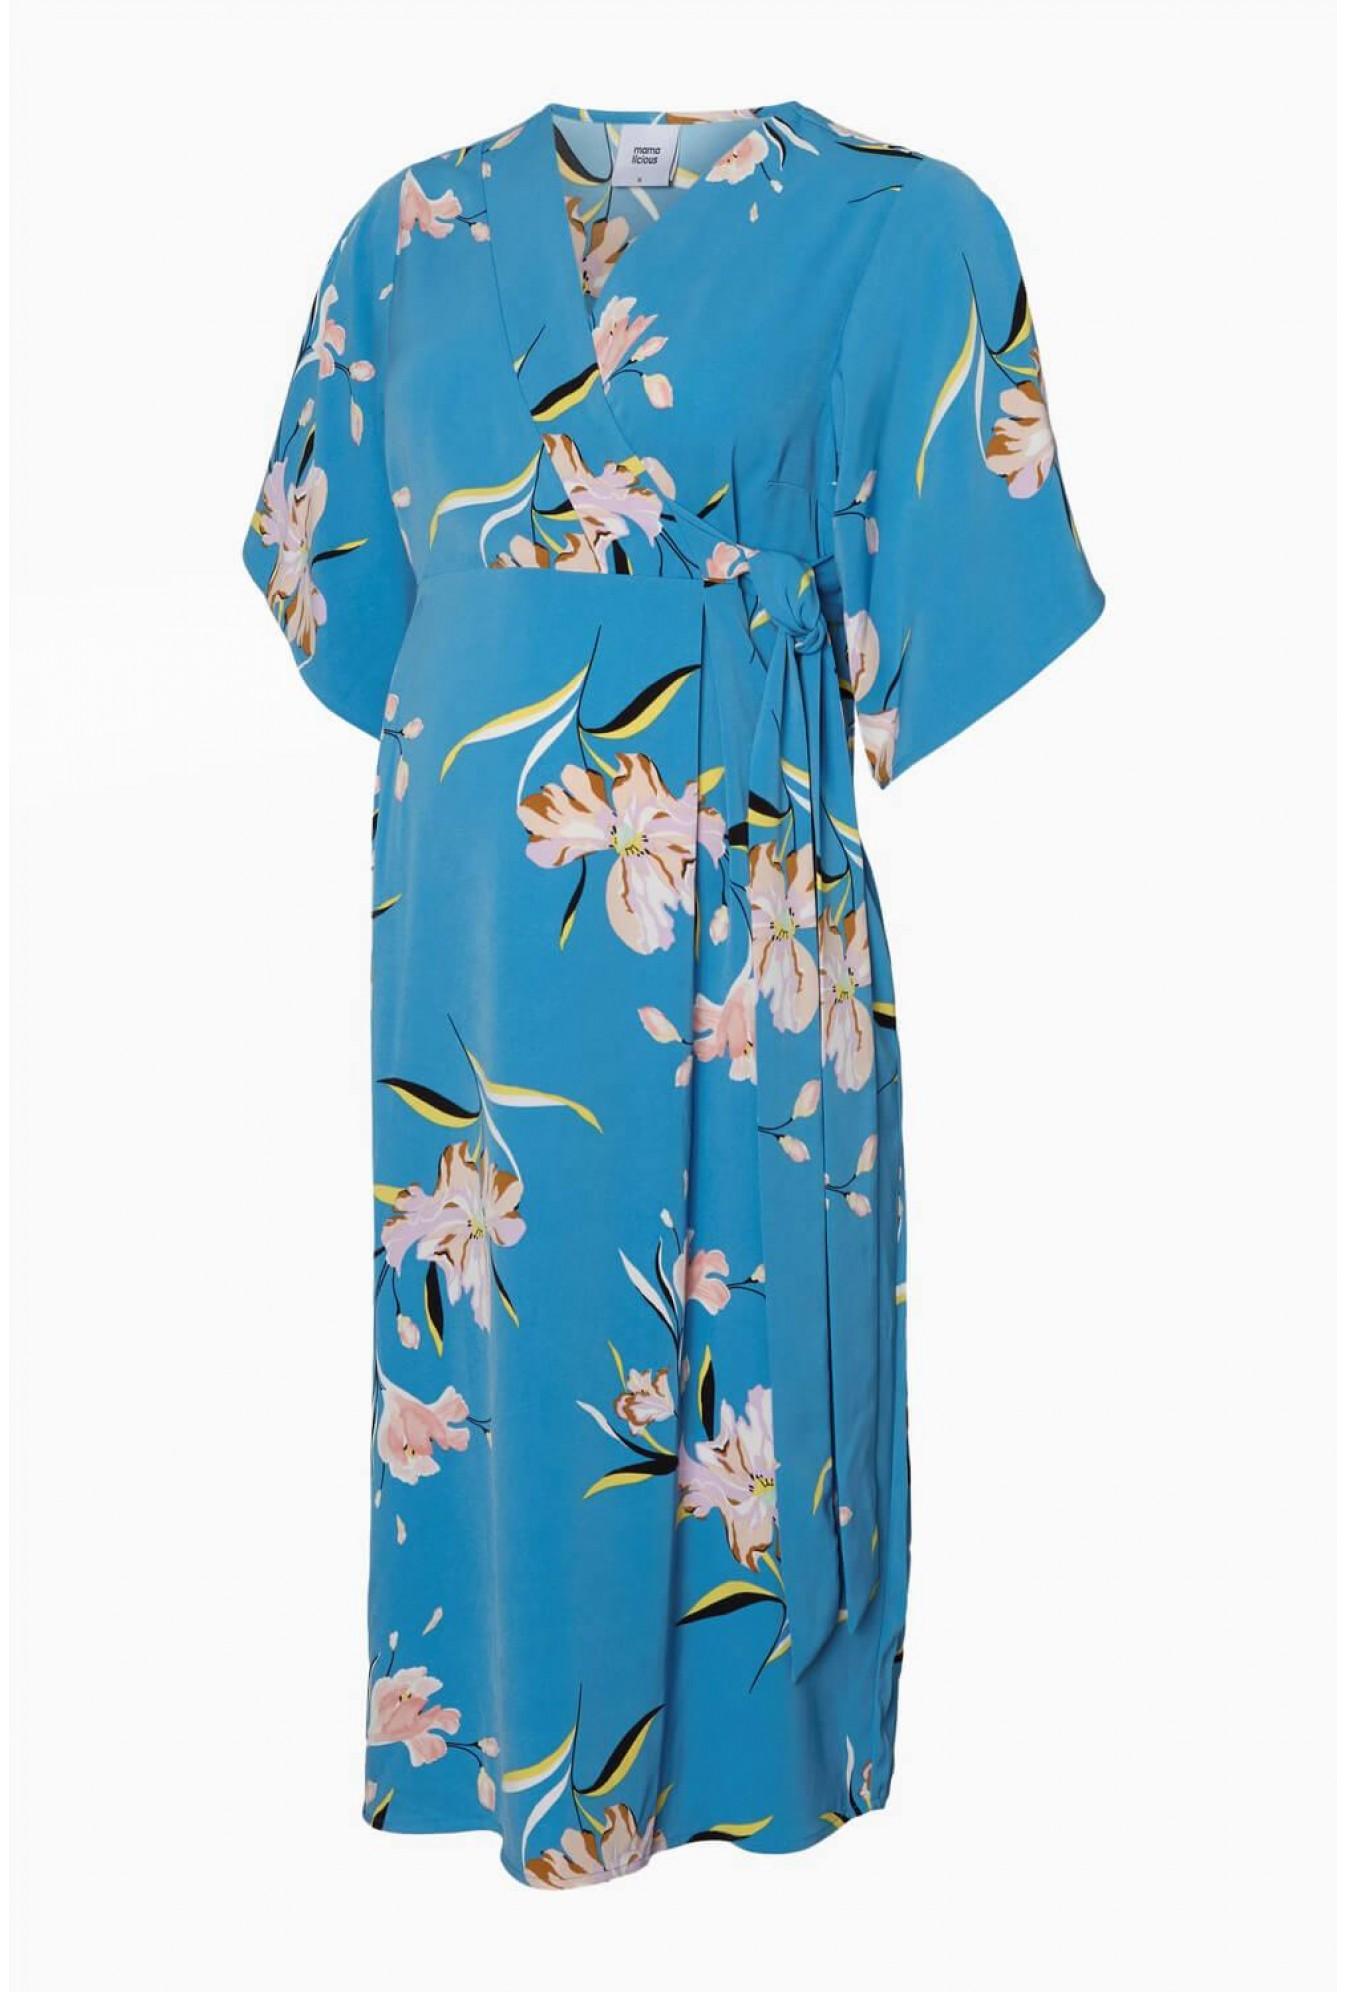 5bf29274509c0 Mamalicious Martina Woven Maternity Midi Dress | iCLOTHING